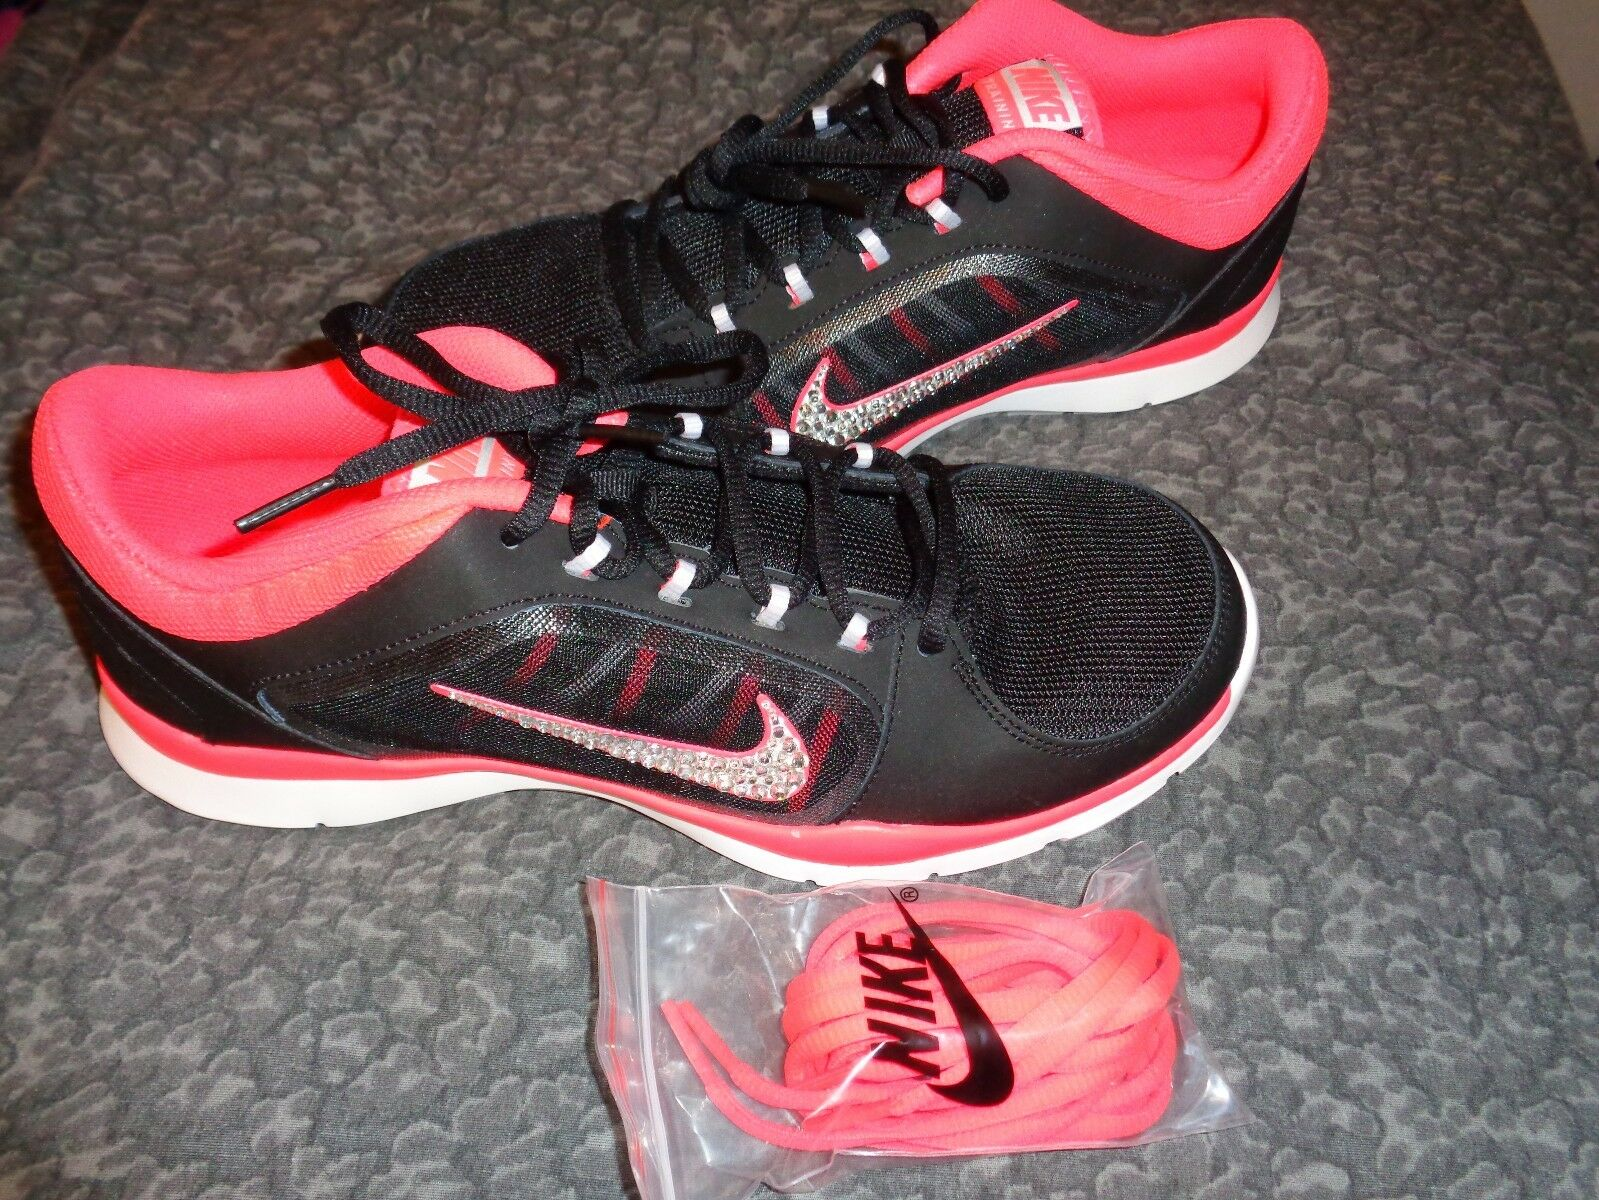 7e06a795617f Bling Rhinestone Nike Flex Trainer 4 Black Pink SNEAKERS Stylish Custom 11  for sale online